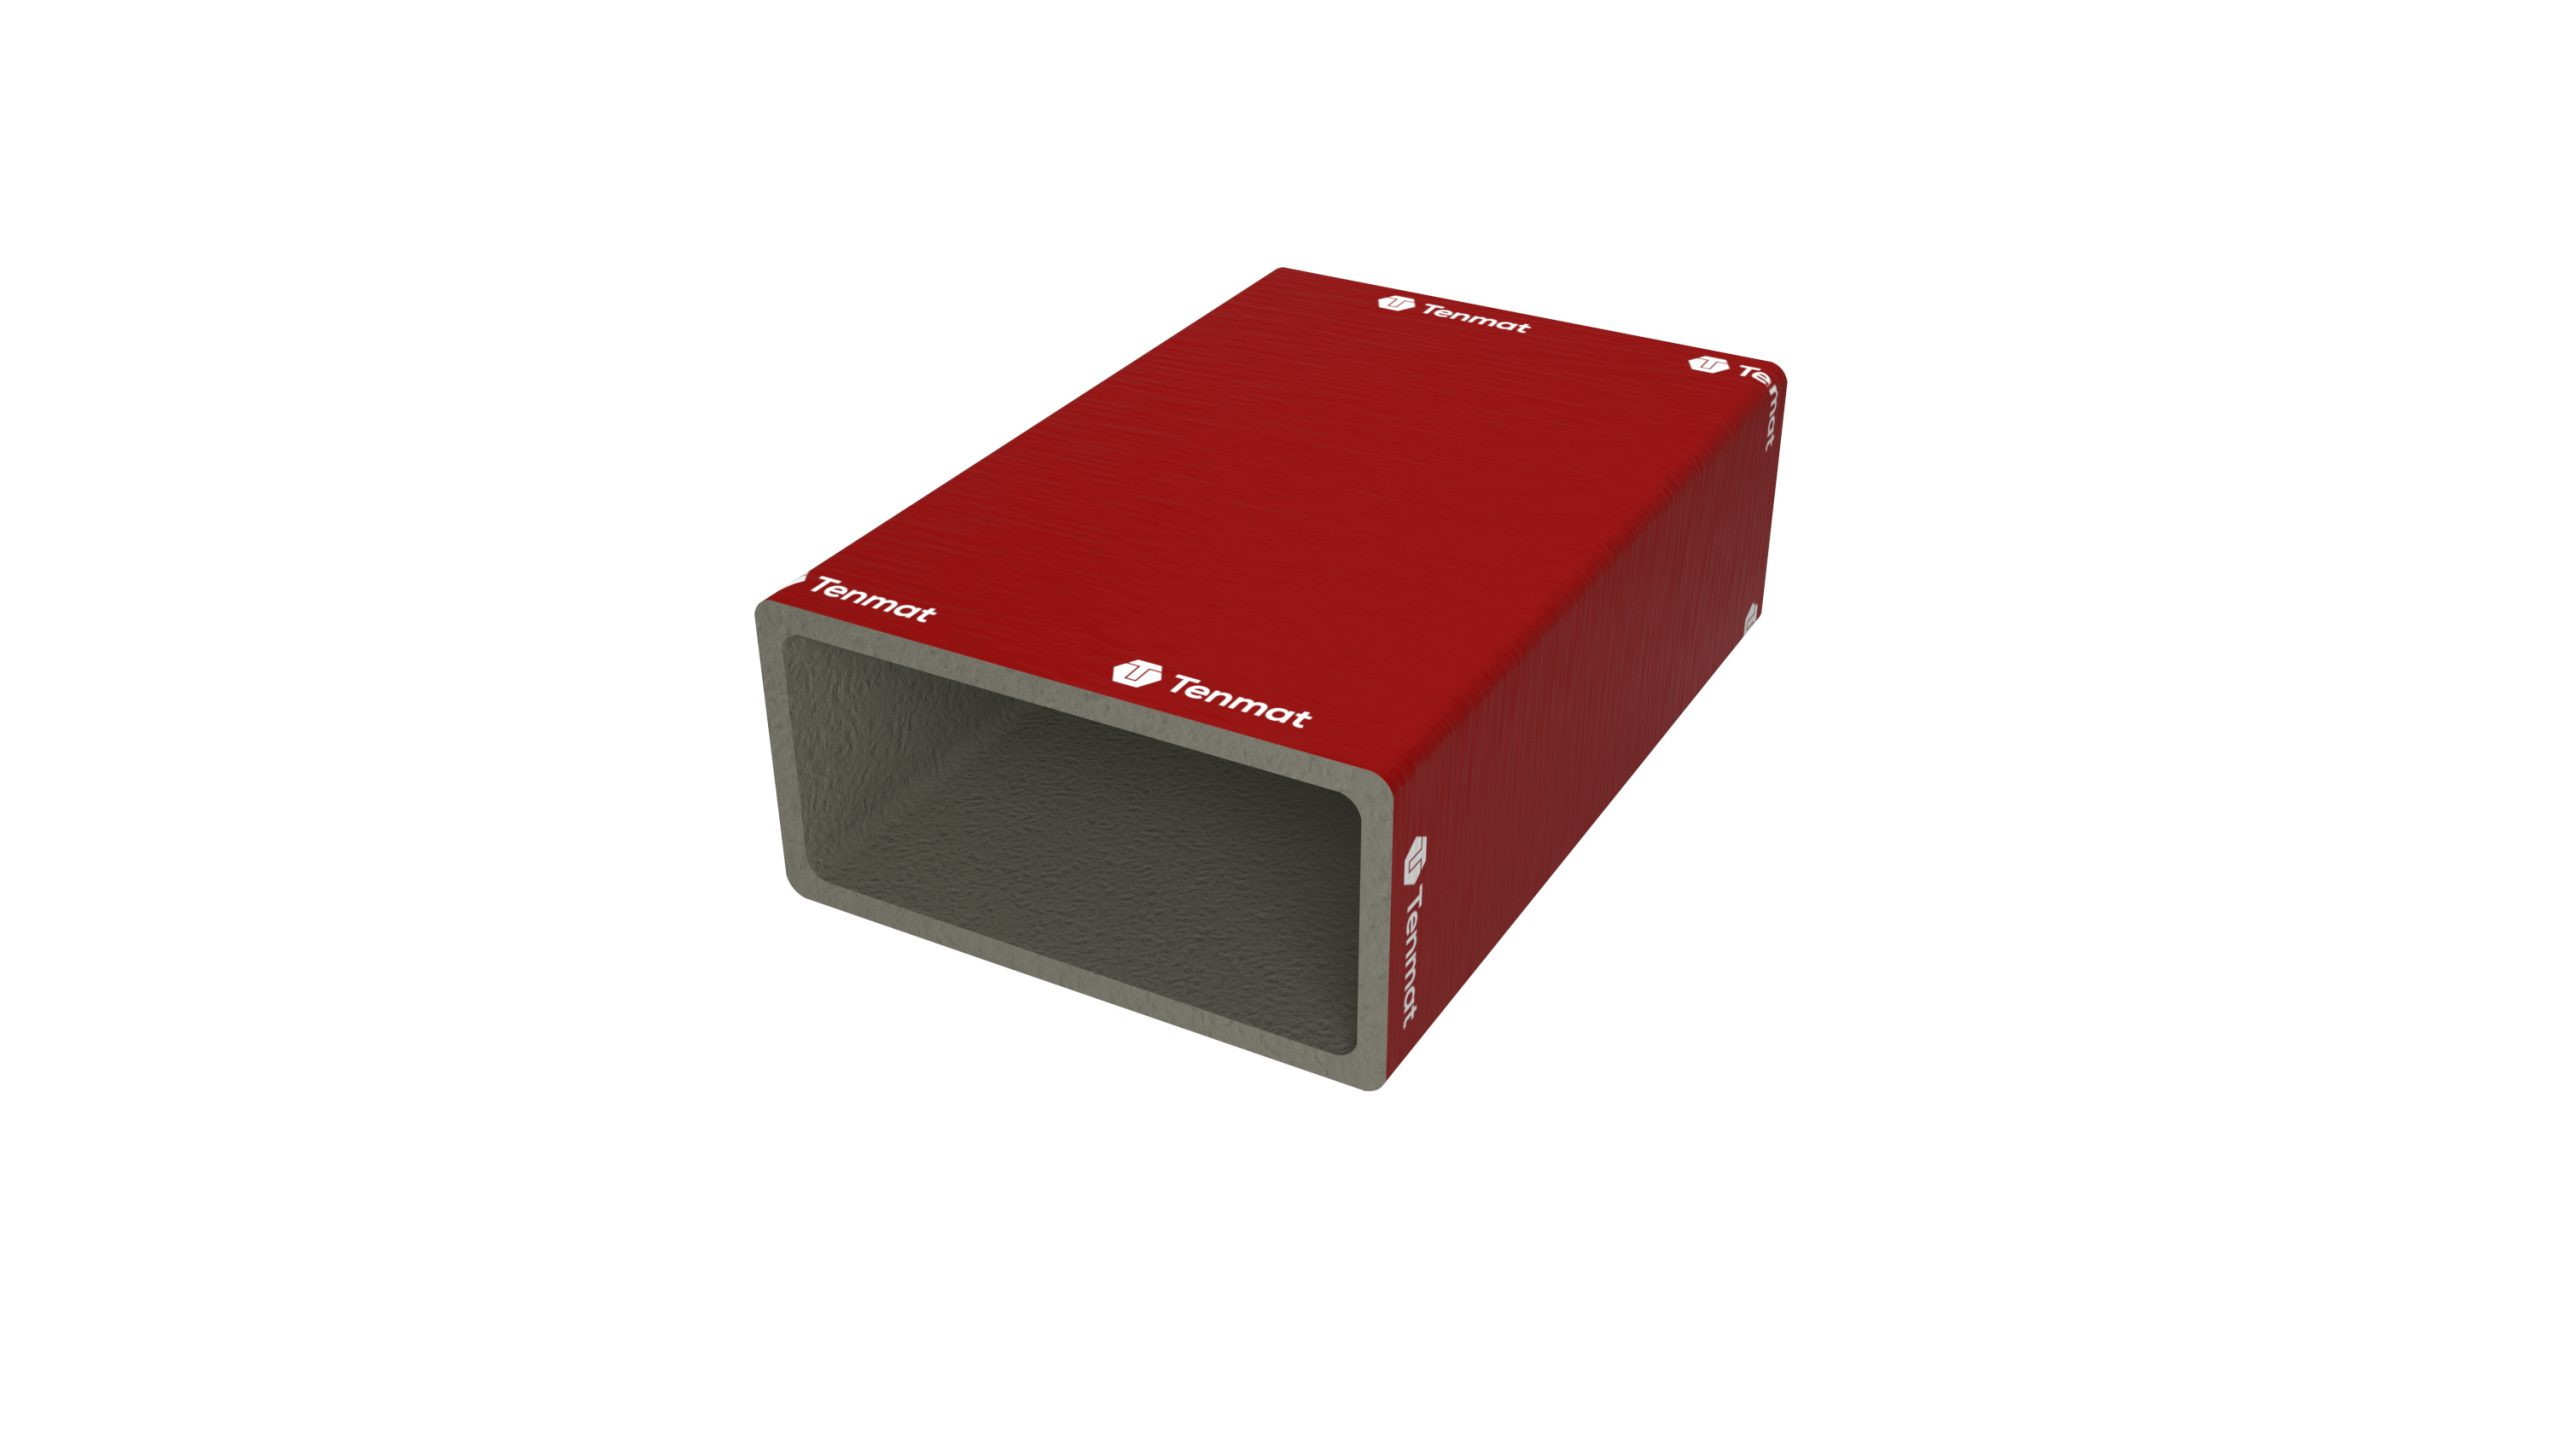 08-fp-ff109-plus-vent-duct-sleeve-lp-product-focussed